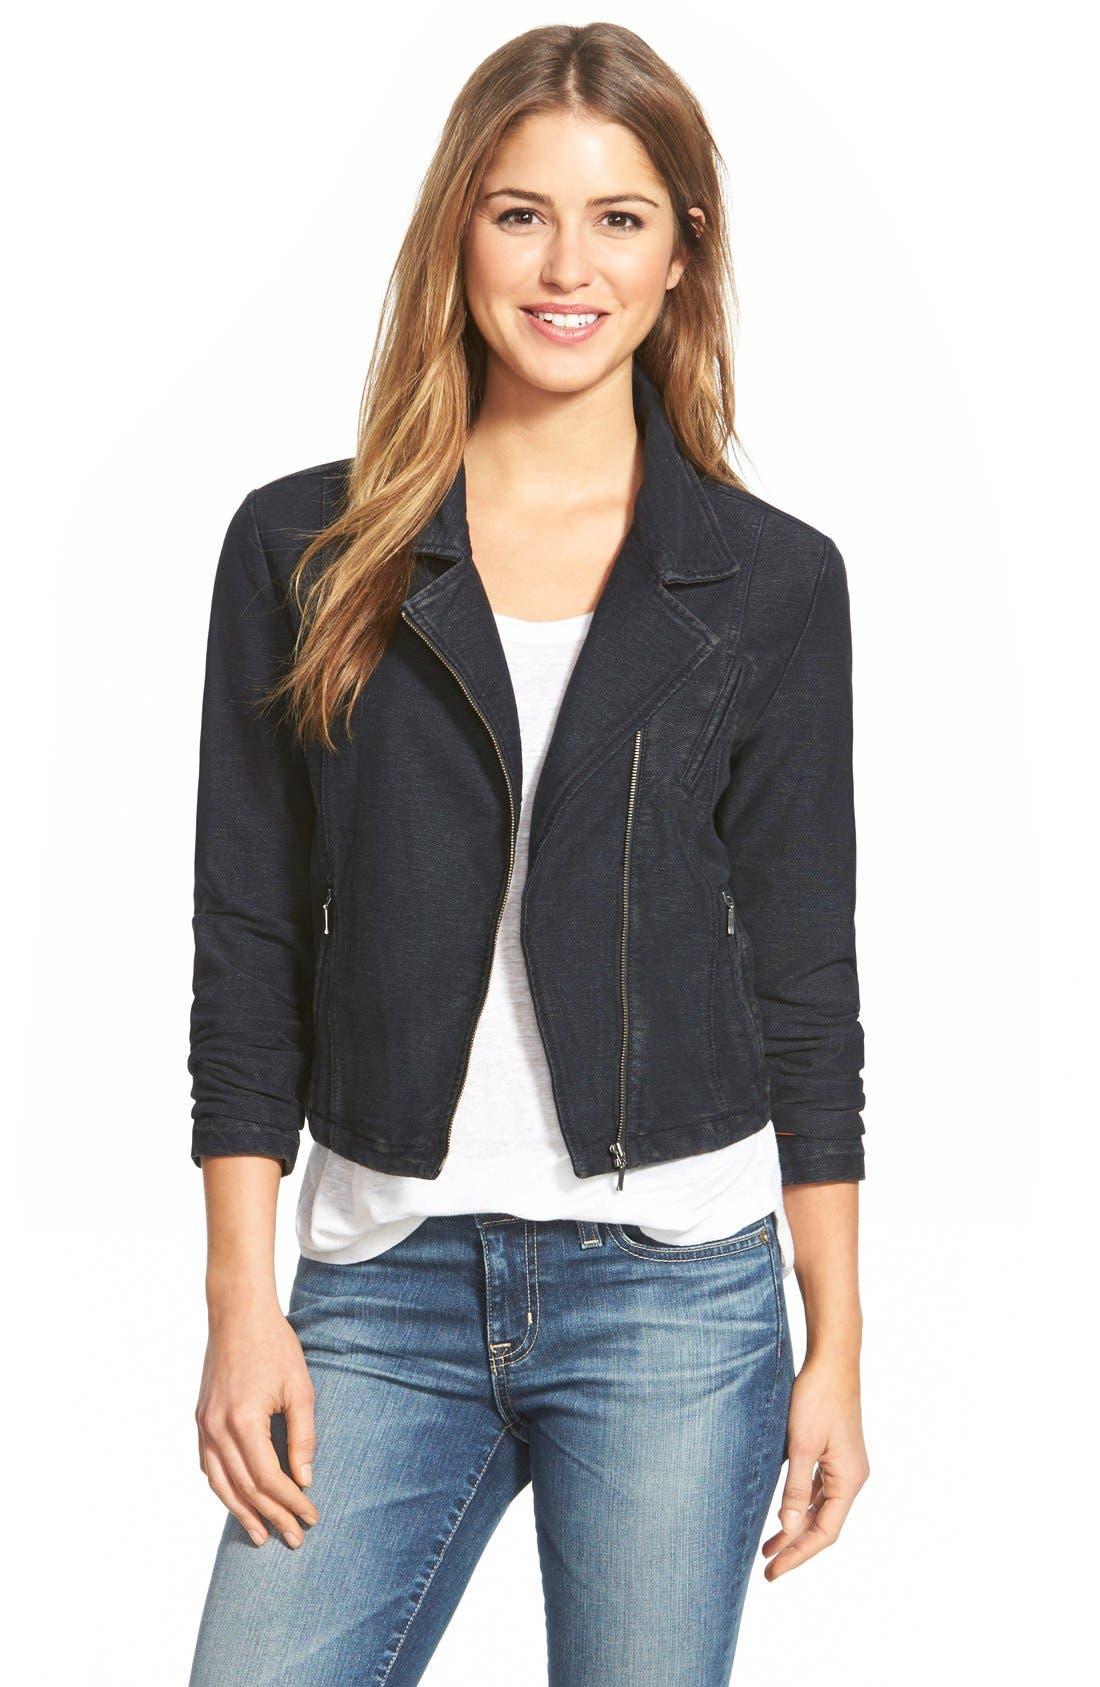 Alternate Image 1 Selected - NIC+ZOE Knit Denim Moto Jacket